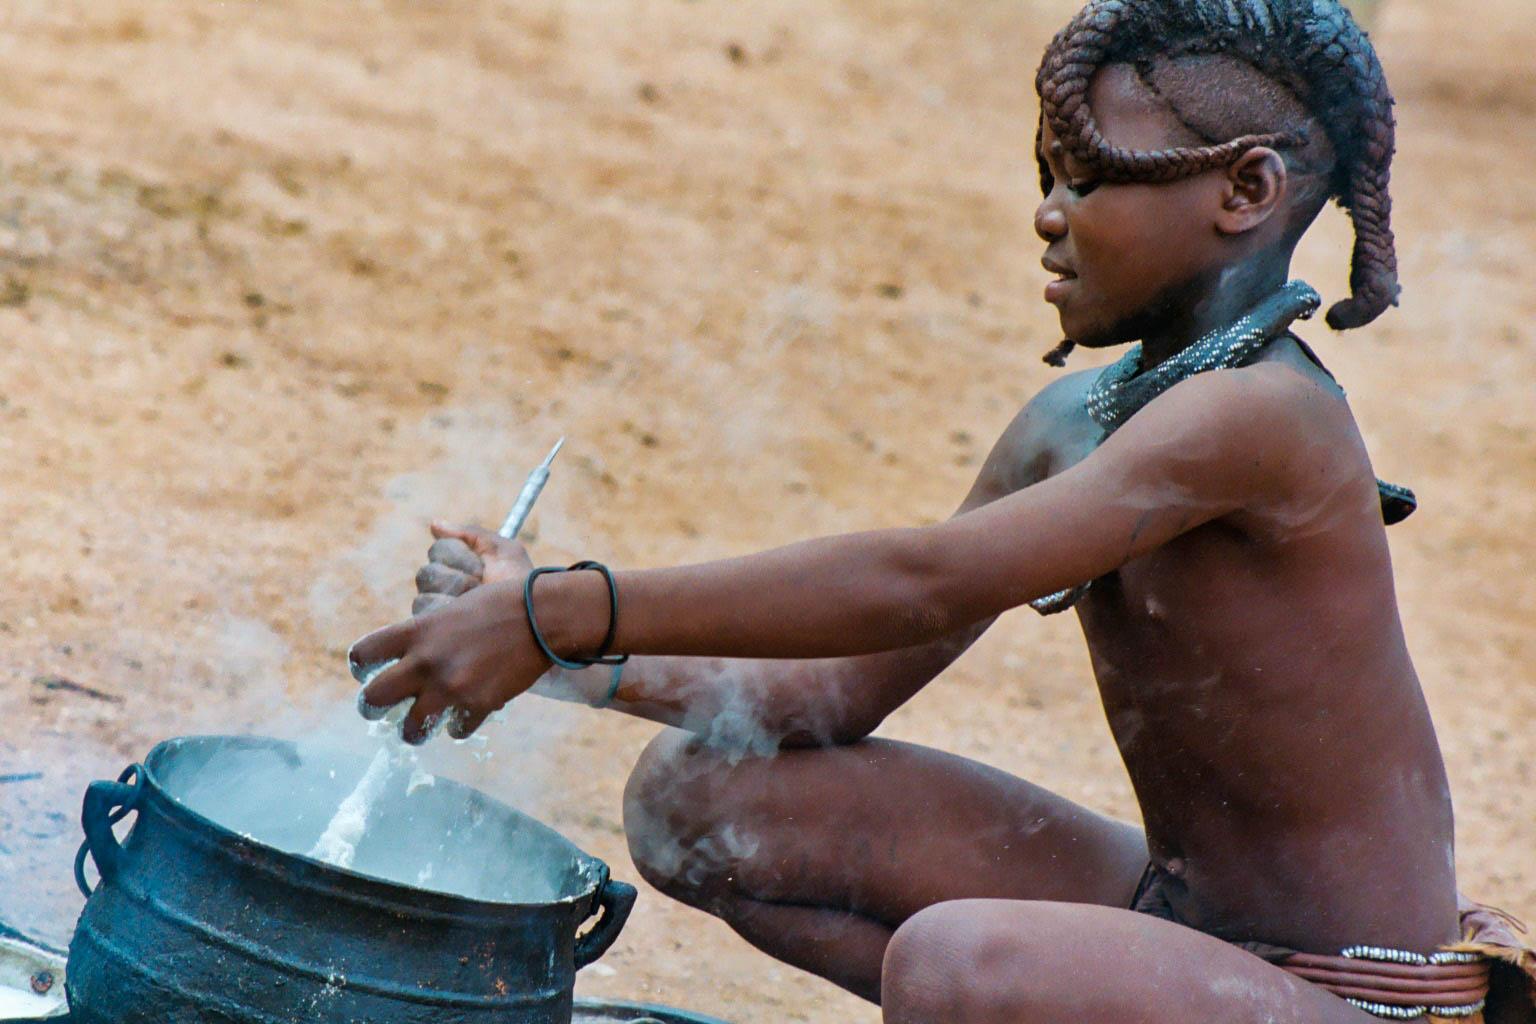 Himba girl cooking, Namibia